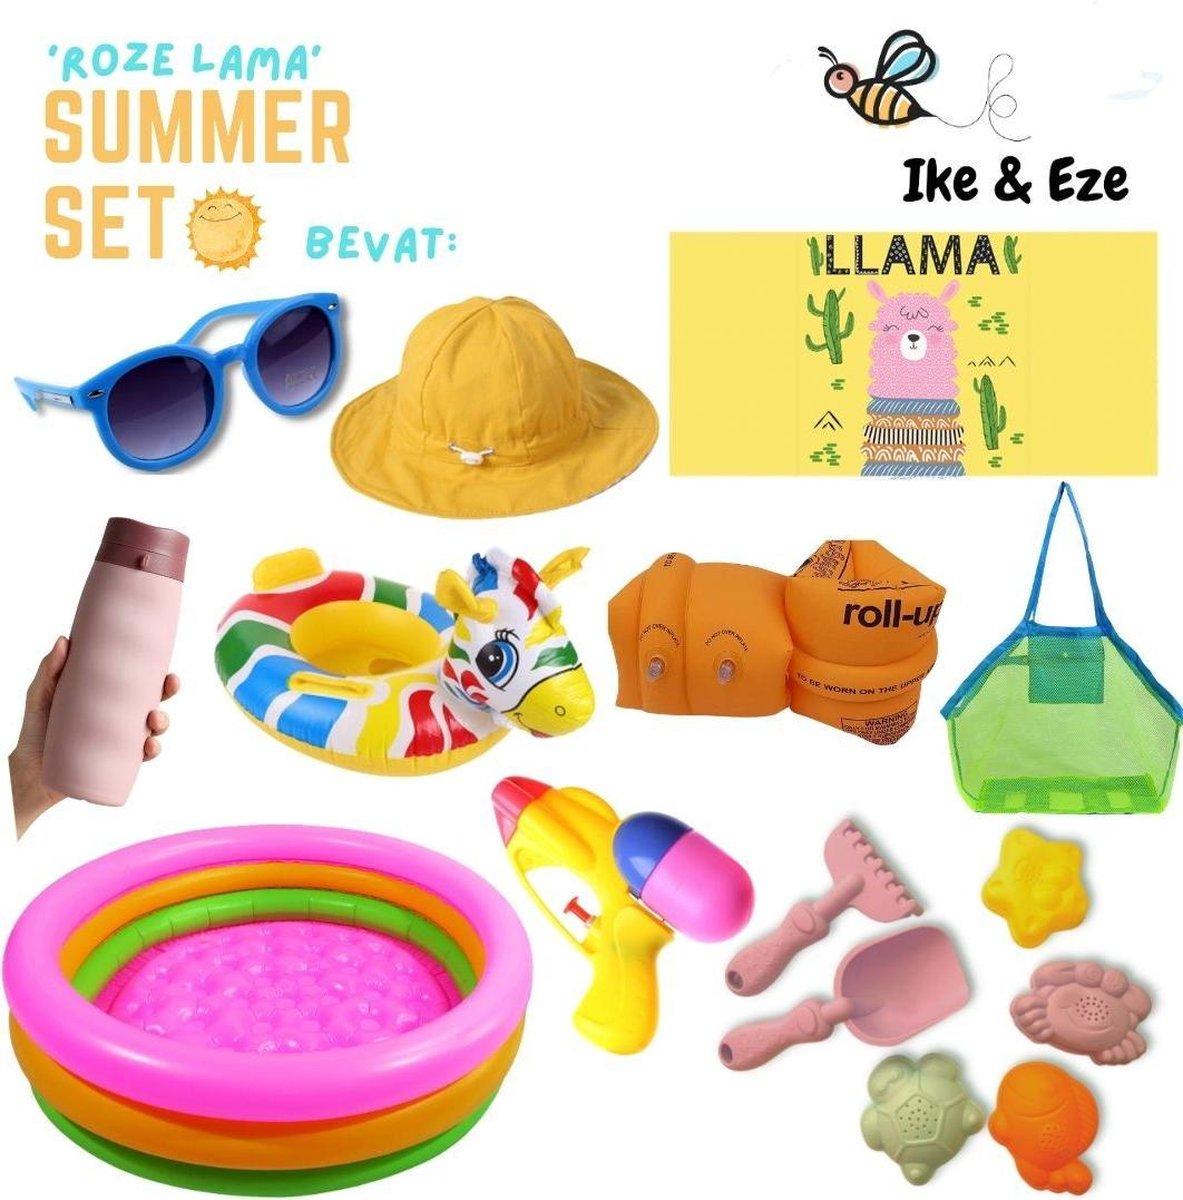 'Roze Lama' Summer Set - Zomer Set - Strandlaken - strandtas - drinkfles - zonnebril - zon hoedje - opblaasbaar zwembad, zwembandjes en zwemband - zandvormpjes - schepje - hakje - waterpistooltje